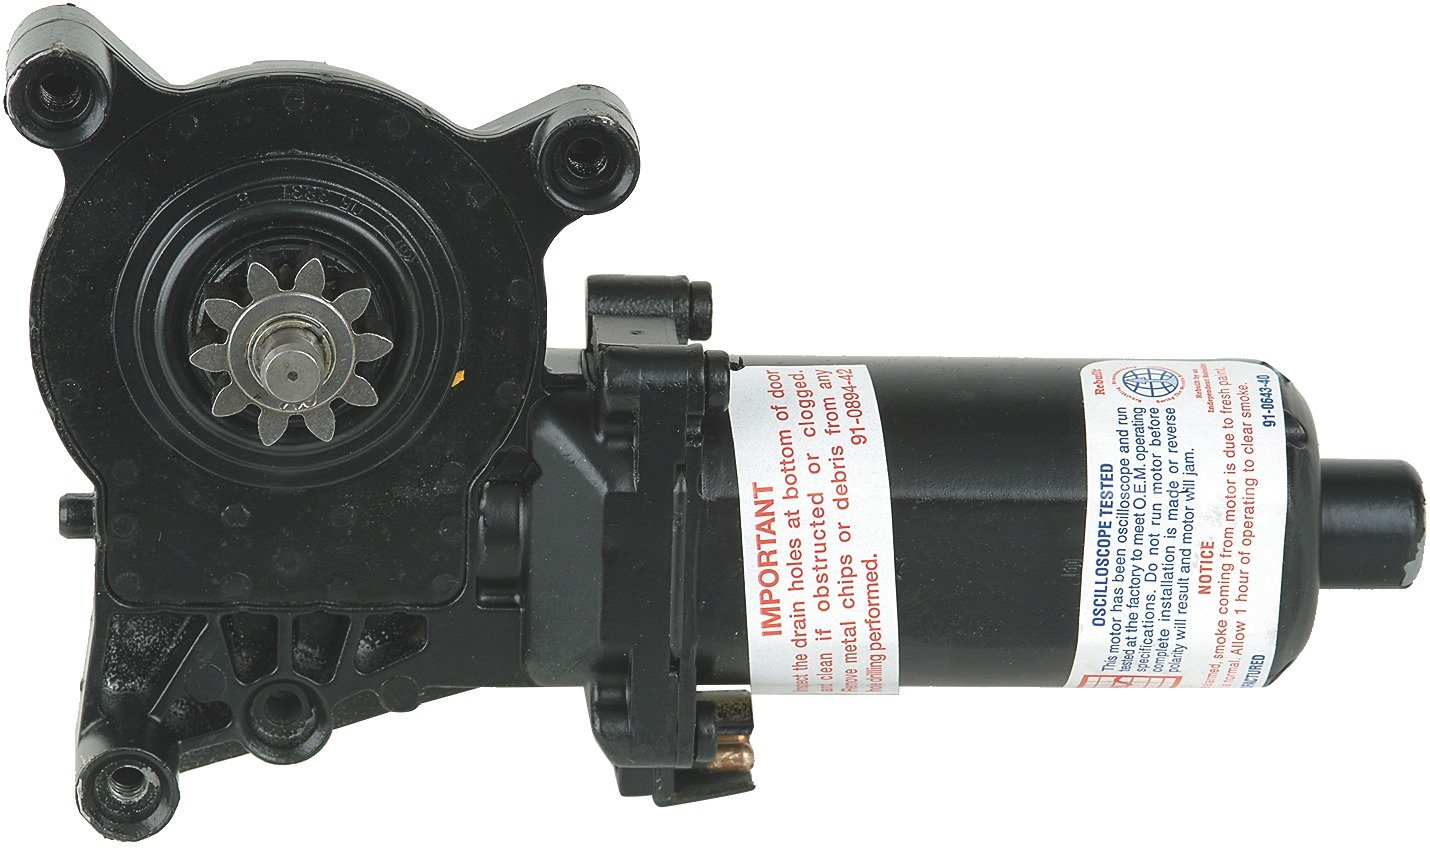 Cardone 47-3403 Remanufactured Import Window Lift Motor A1 Cardone